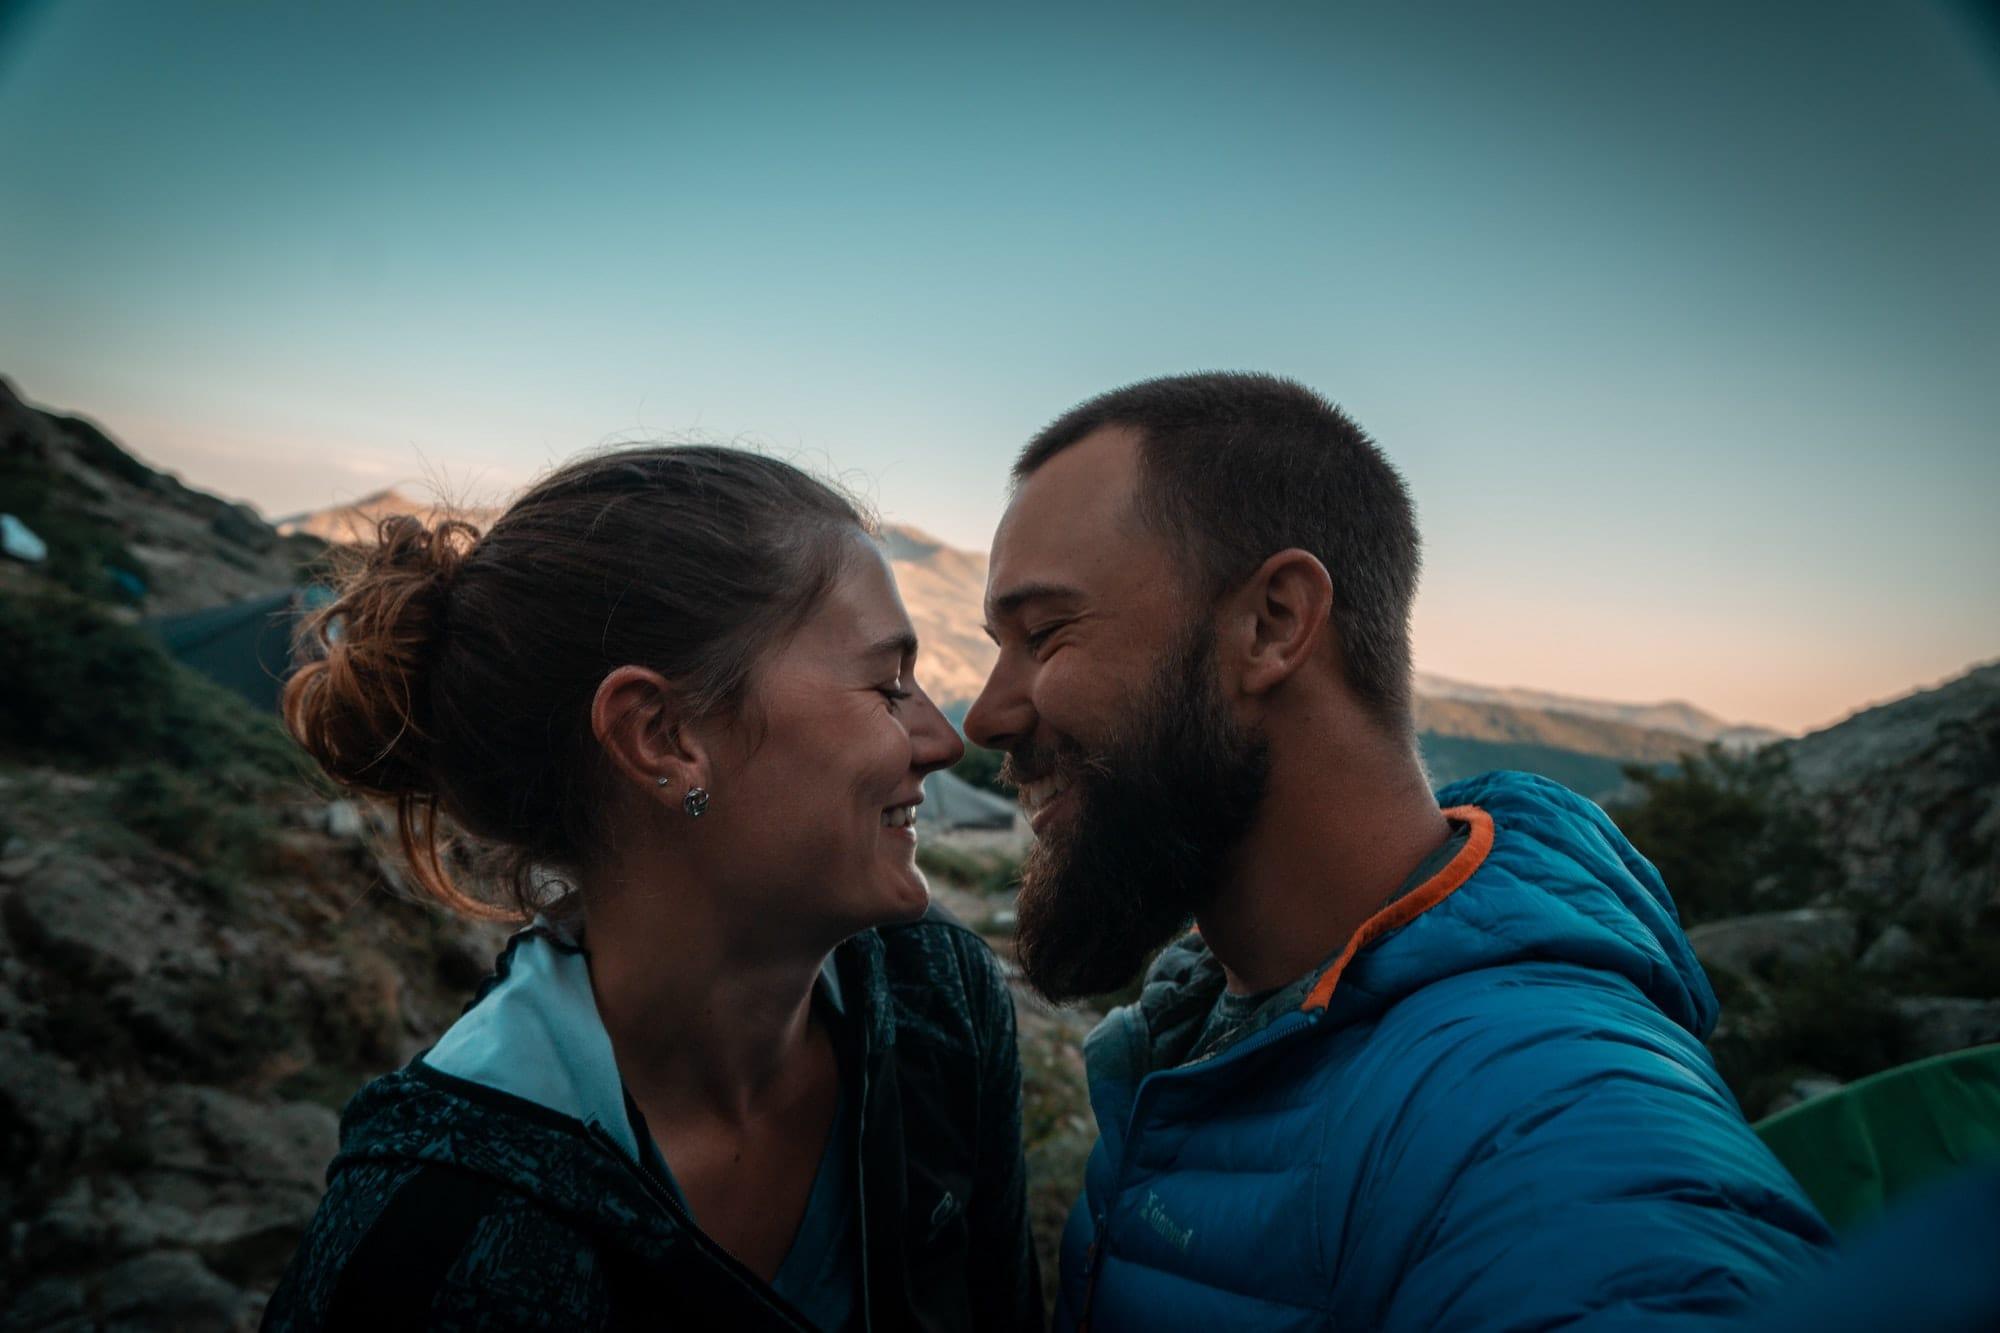 Finde deinen Partner bei wander-partner.com